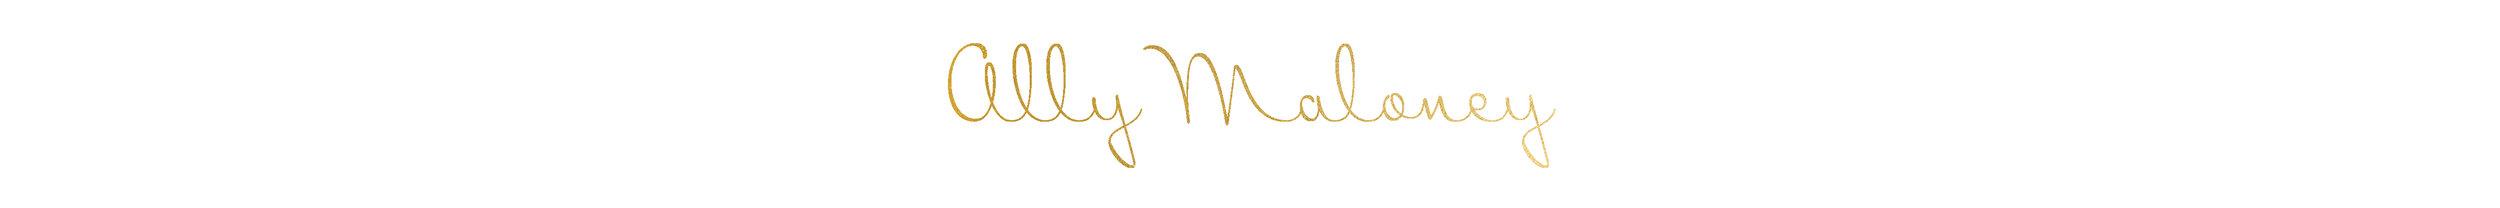 Rhode_Island_Interior_Designer_Ally_Maloney_Signature.jpg